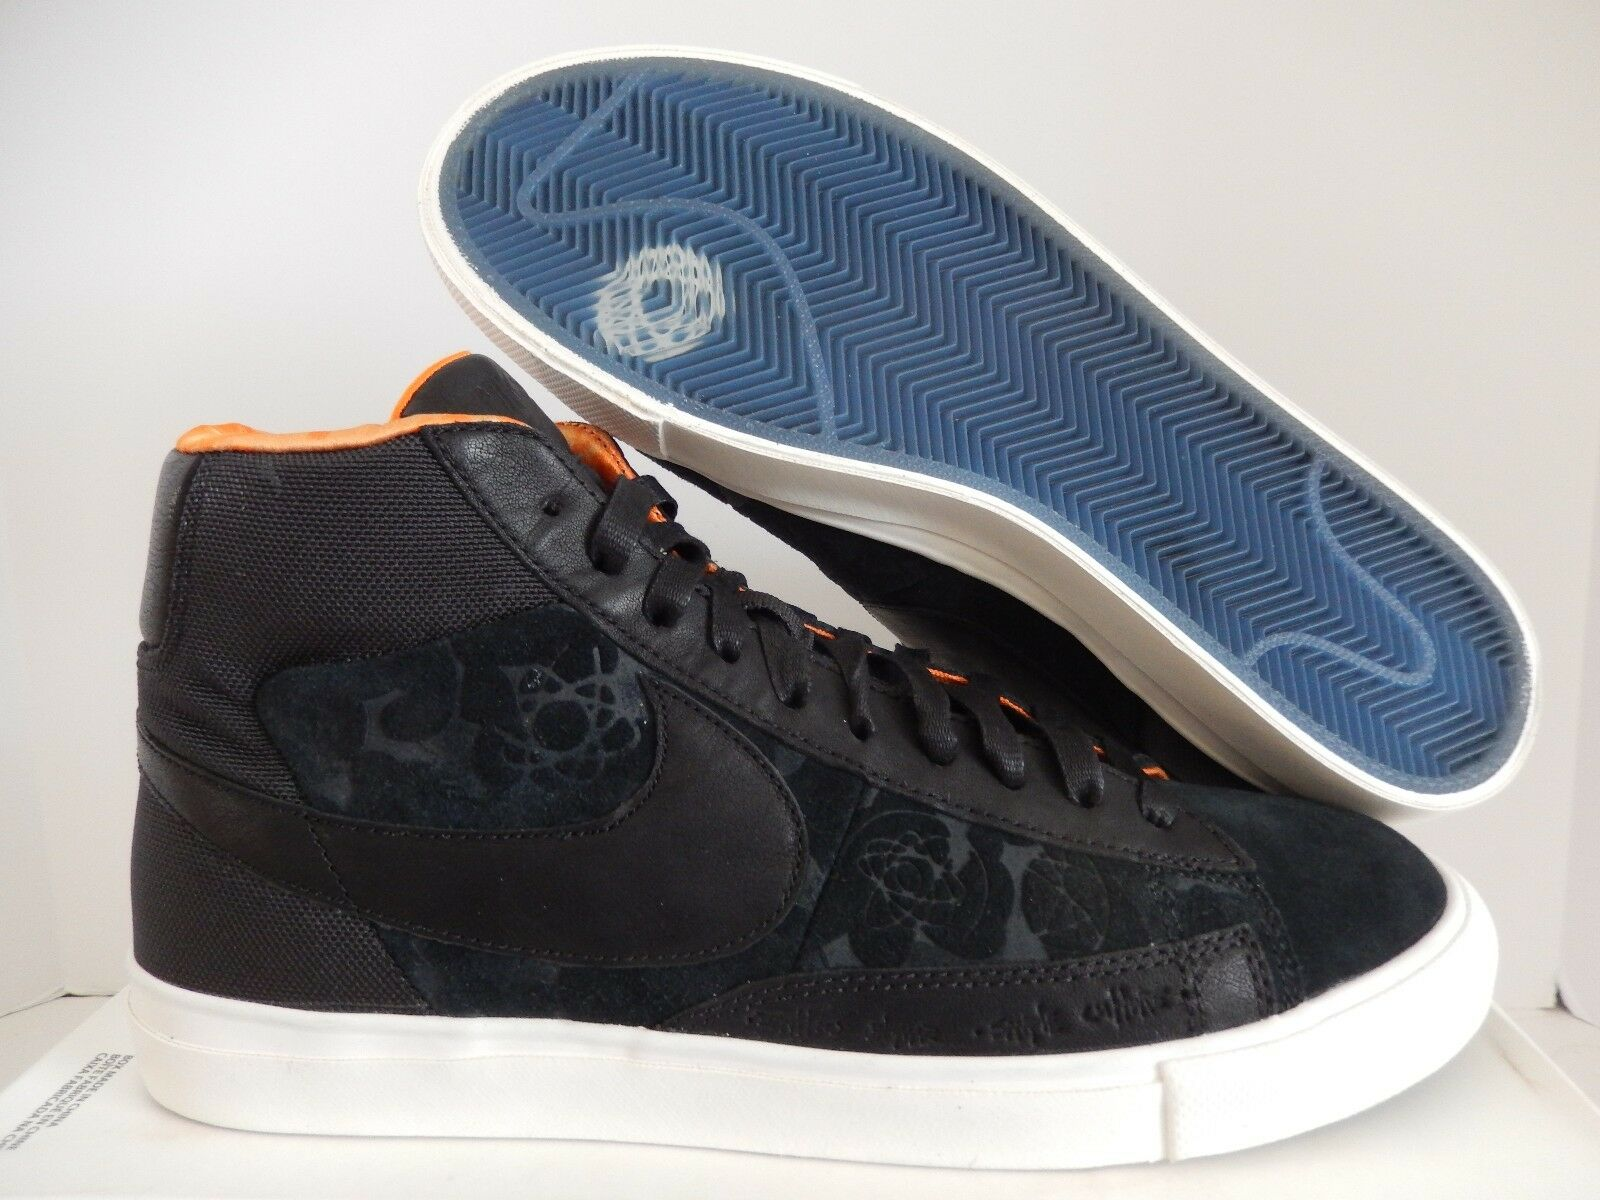 Nike blazer - sp / mowax nero-copper flash quickstrike!! sz 9,5 - 718768-008] quickstrike!! flash c515a6